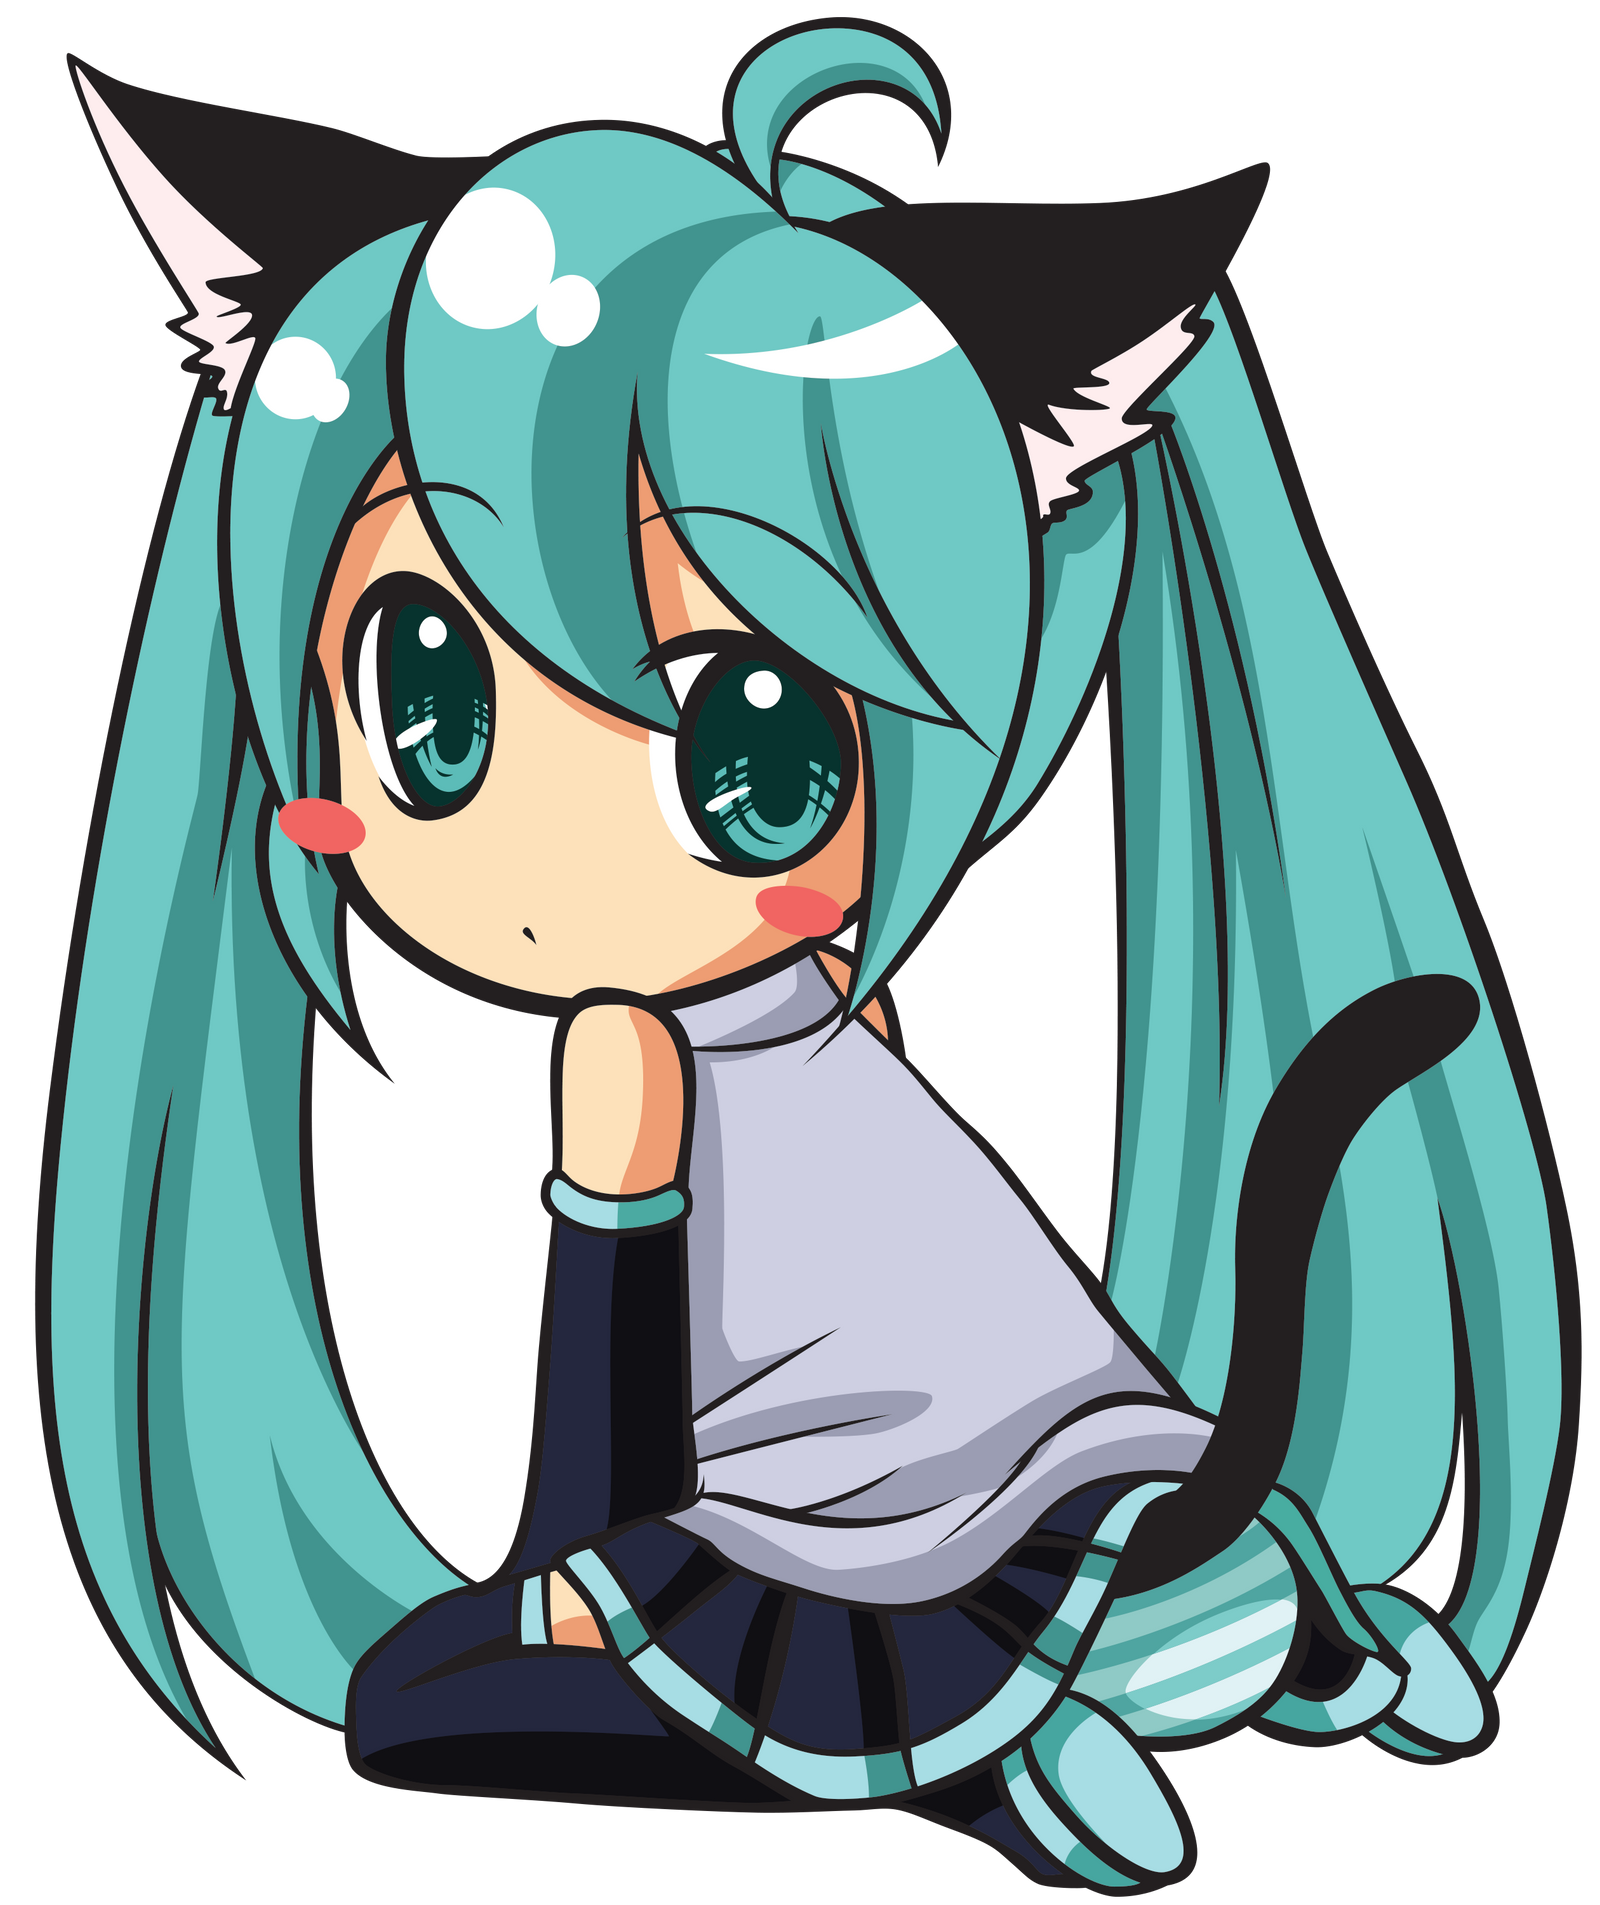 Hatsune Miku Chibi Vector by katsaysmeh on DeviantArt